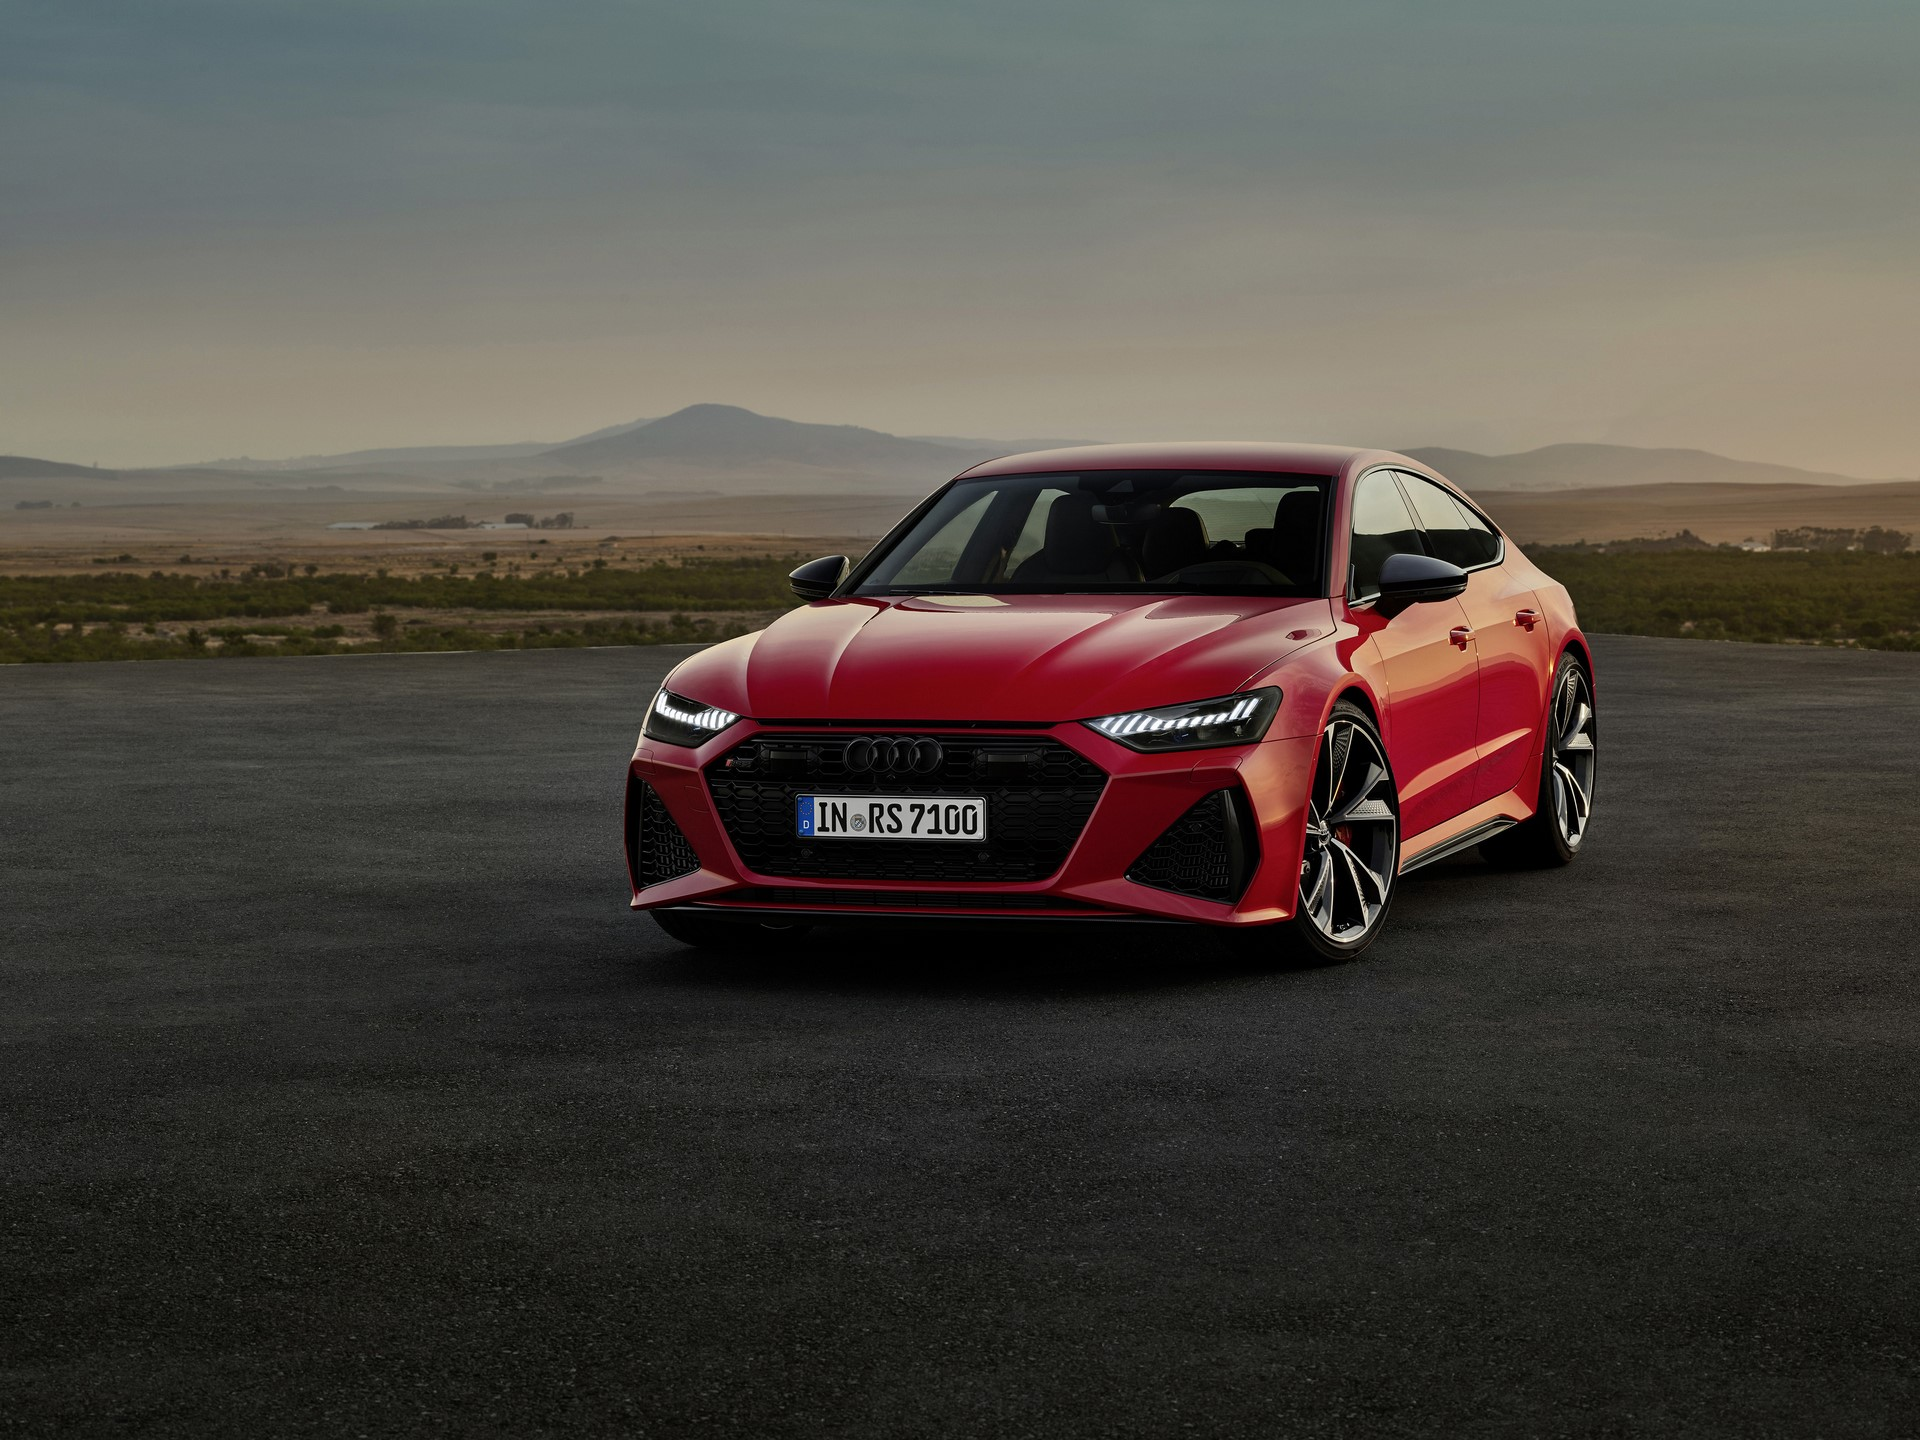 Audi-RS7-Sportback-2019-8